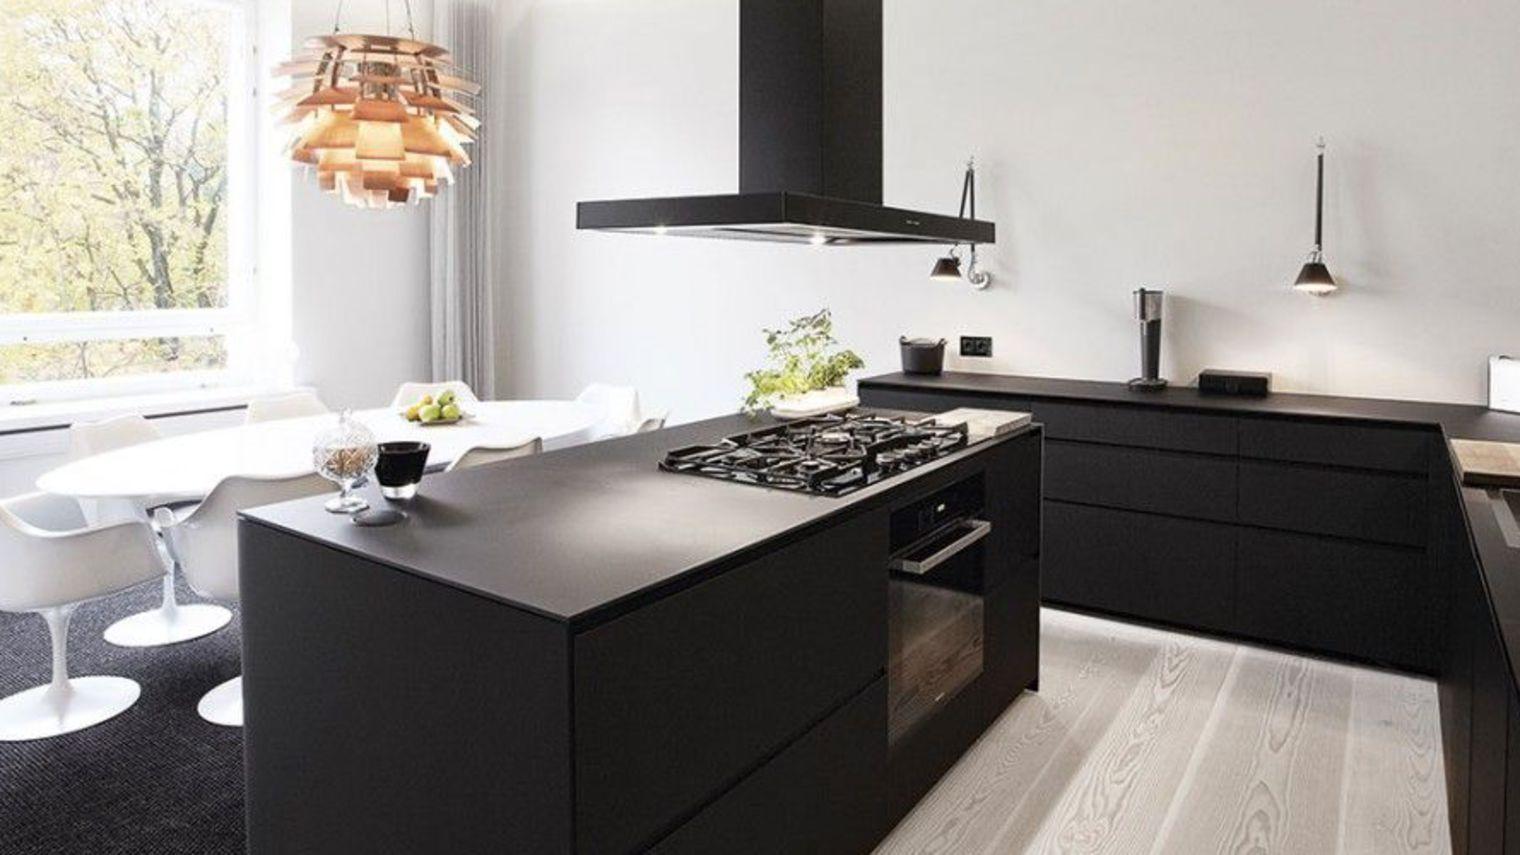 Cuisine Ouverte Design Recherche Google Cuisine Design - Image cuisine ouverte pour idees de deco de cuisine